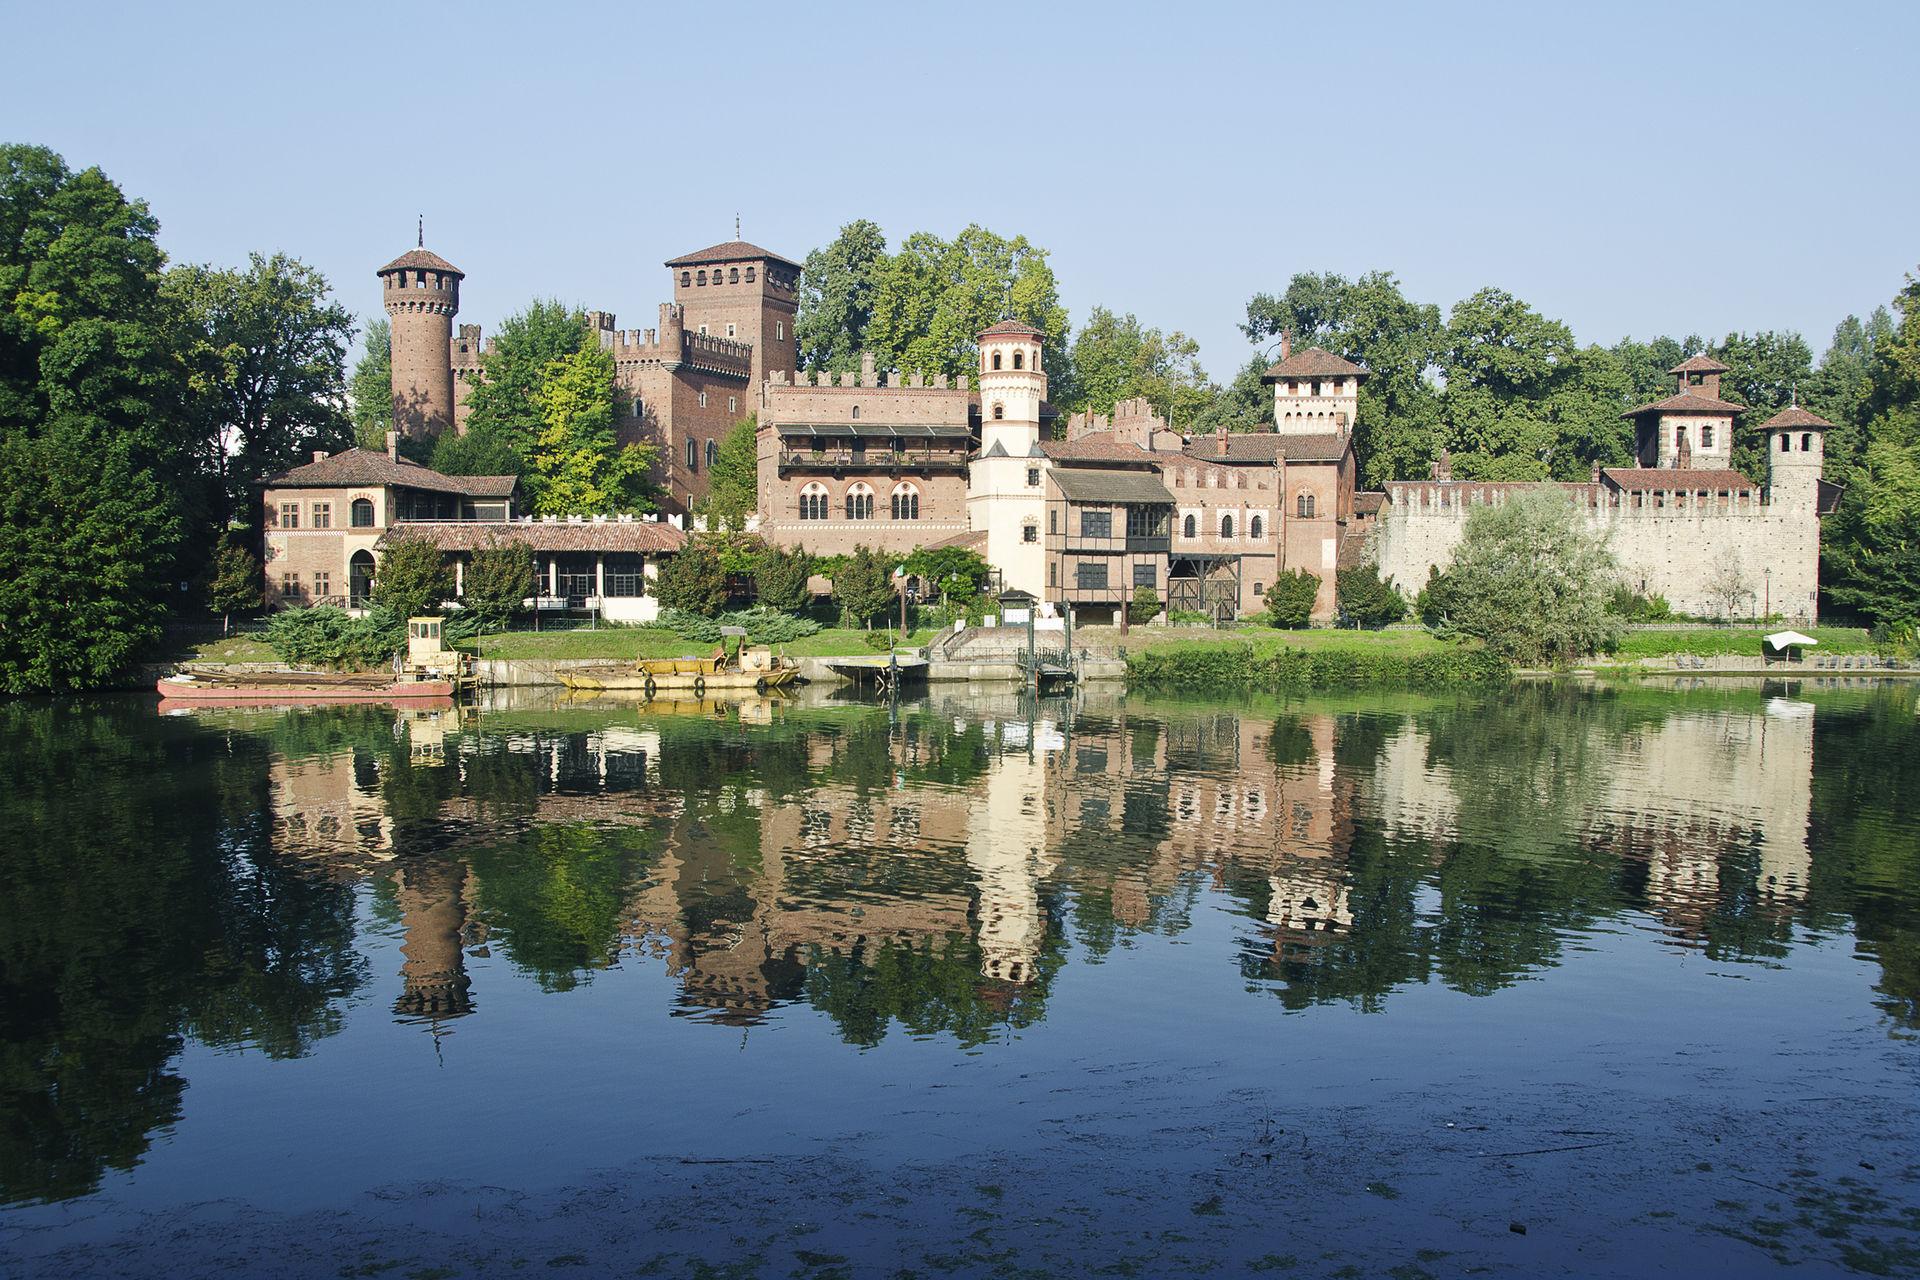 Borgo médieval de Turin dans le parc Valentino - Photo de Angelomalvasia